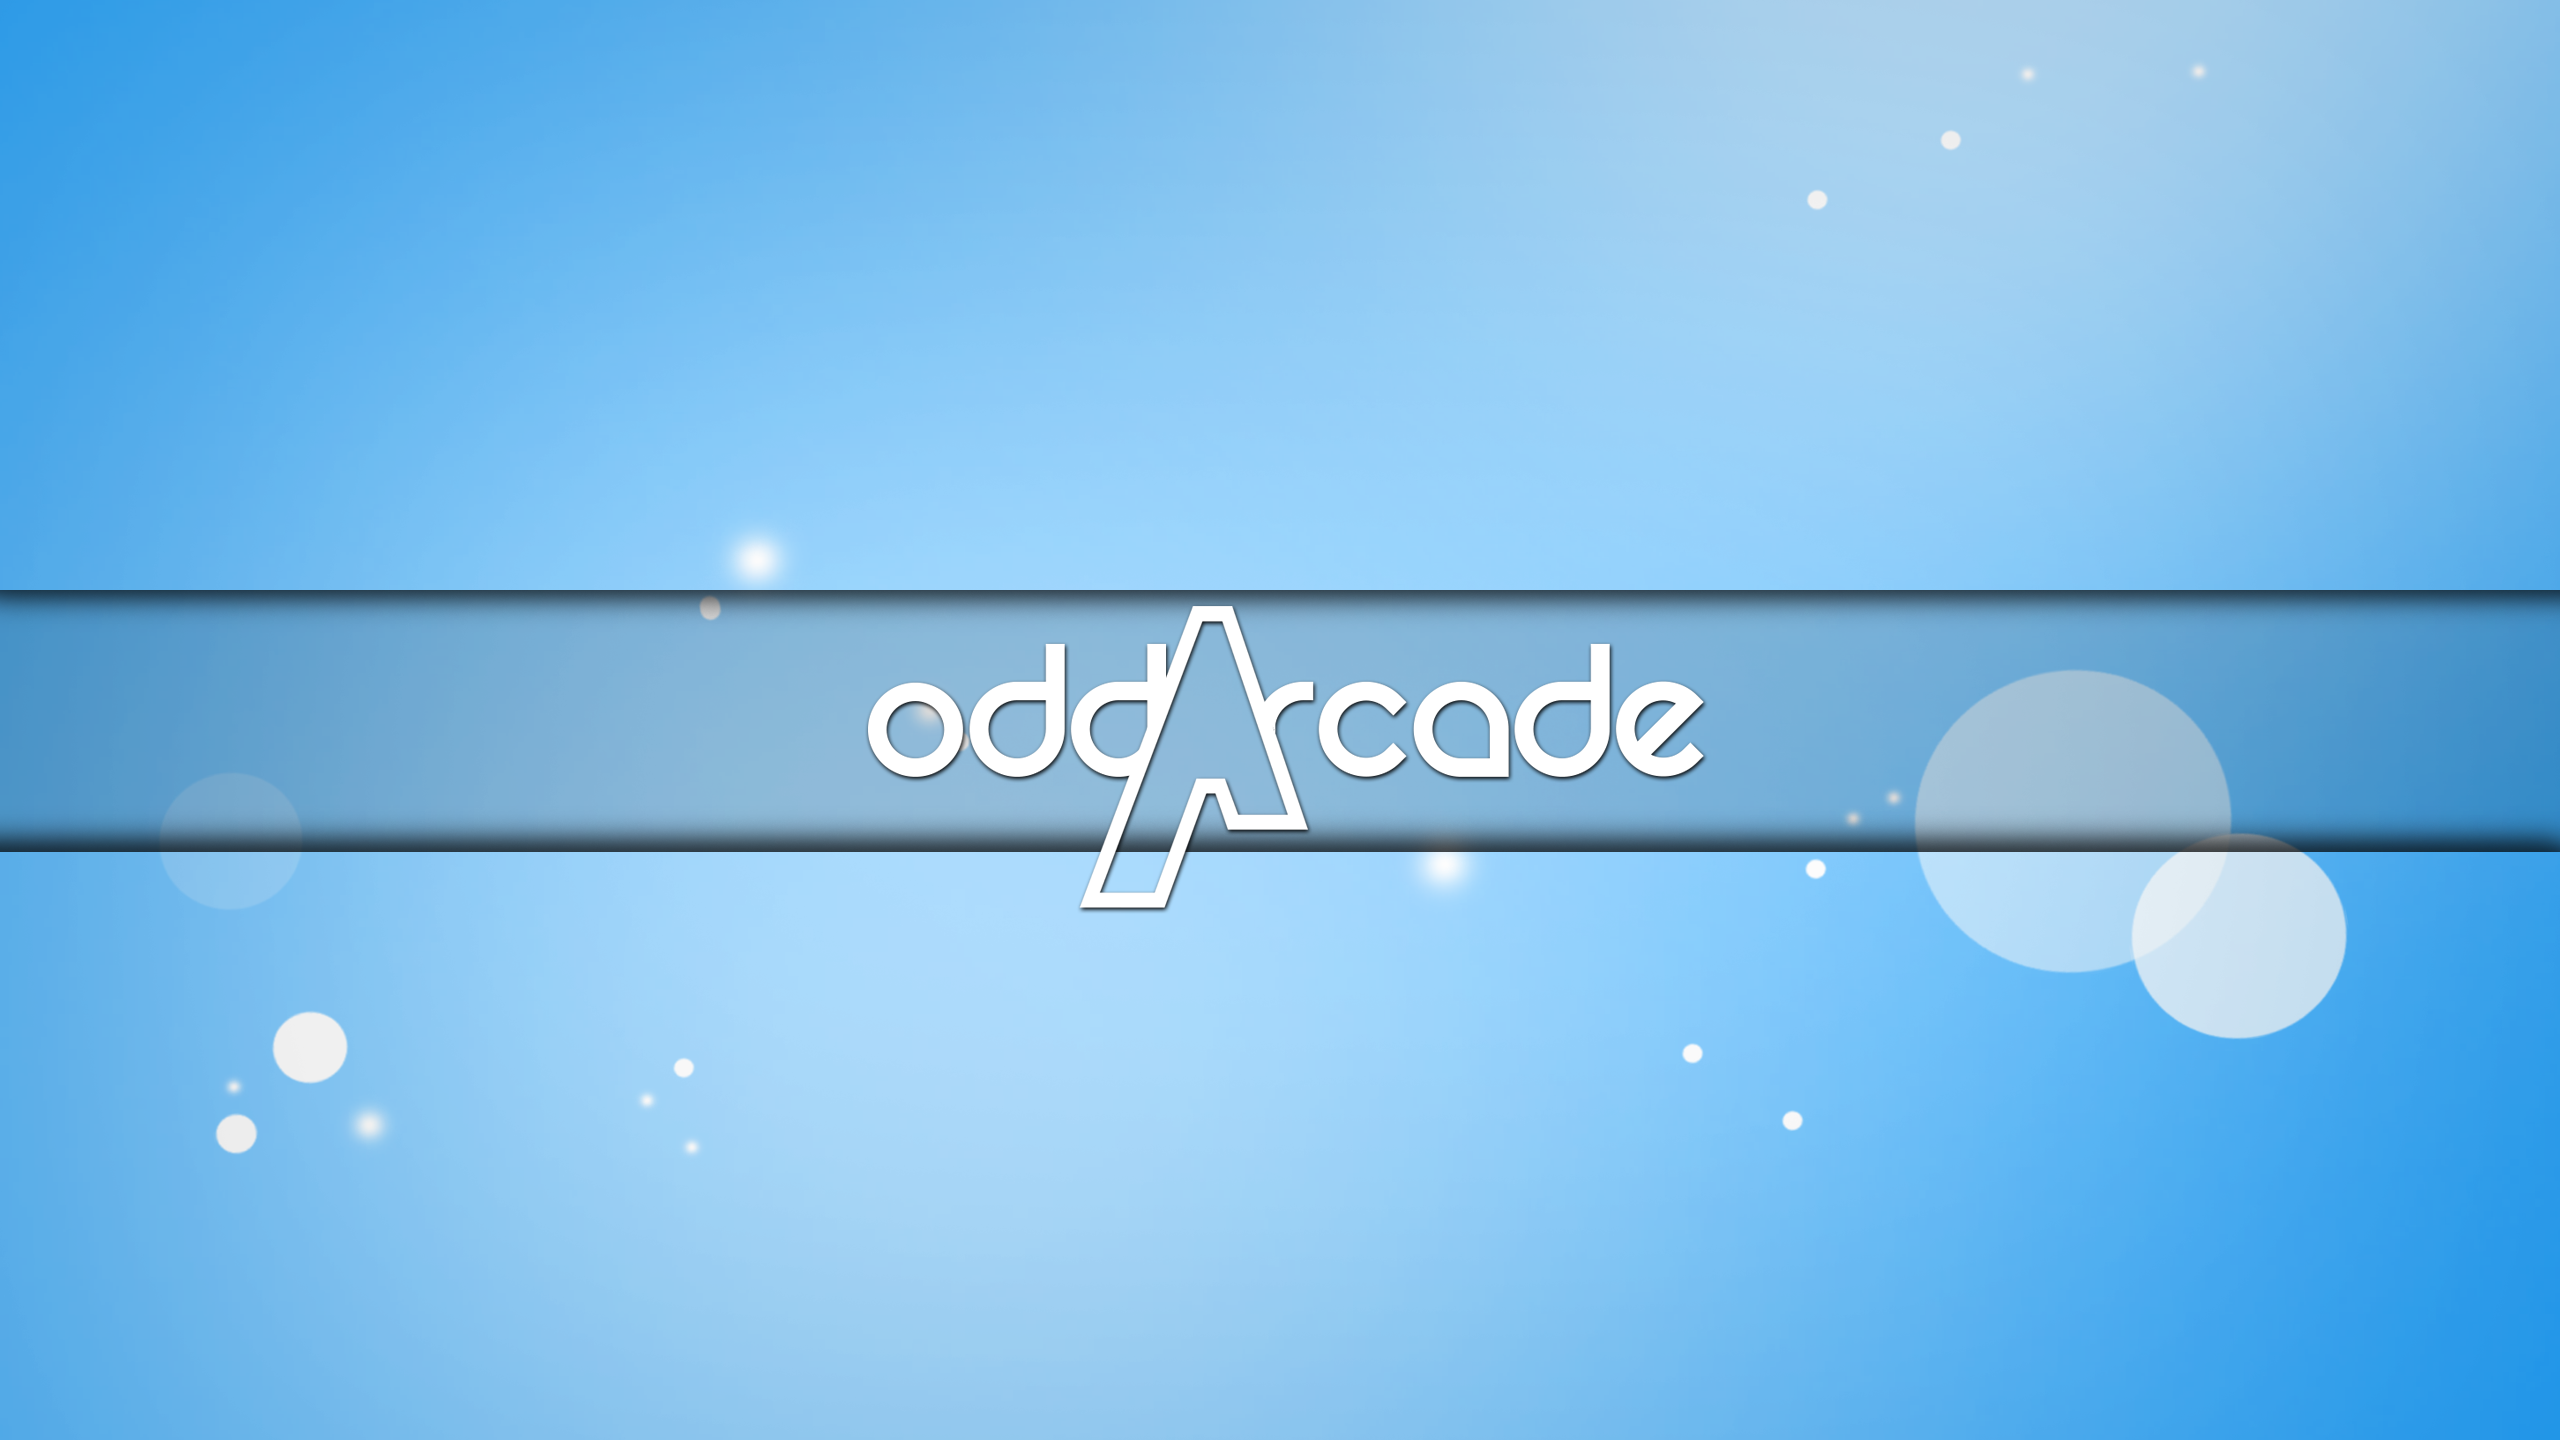 Finished Blue YouTube Banner by OddArcade on DeviantArt